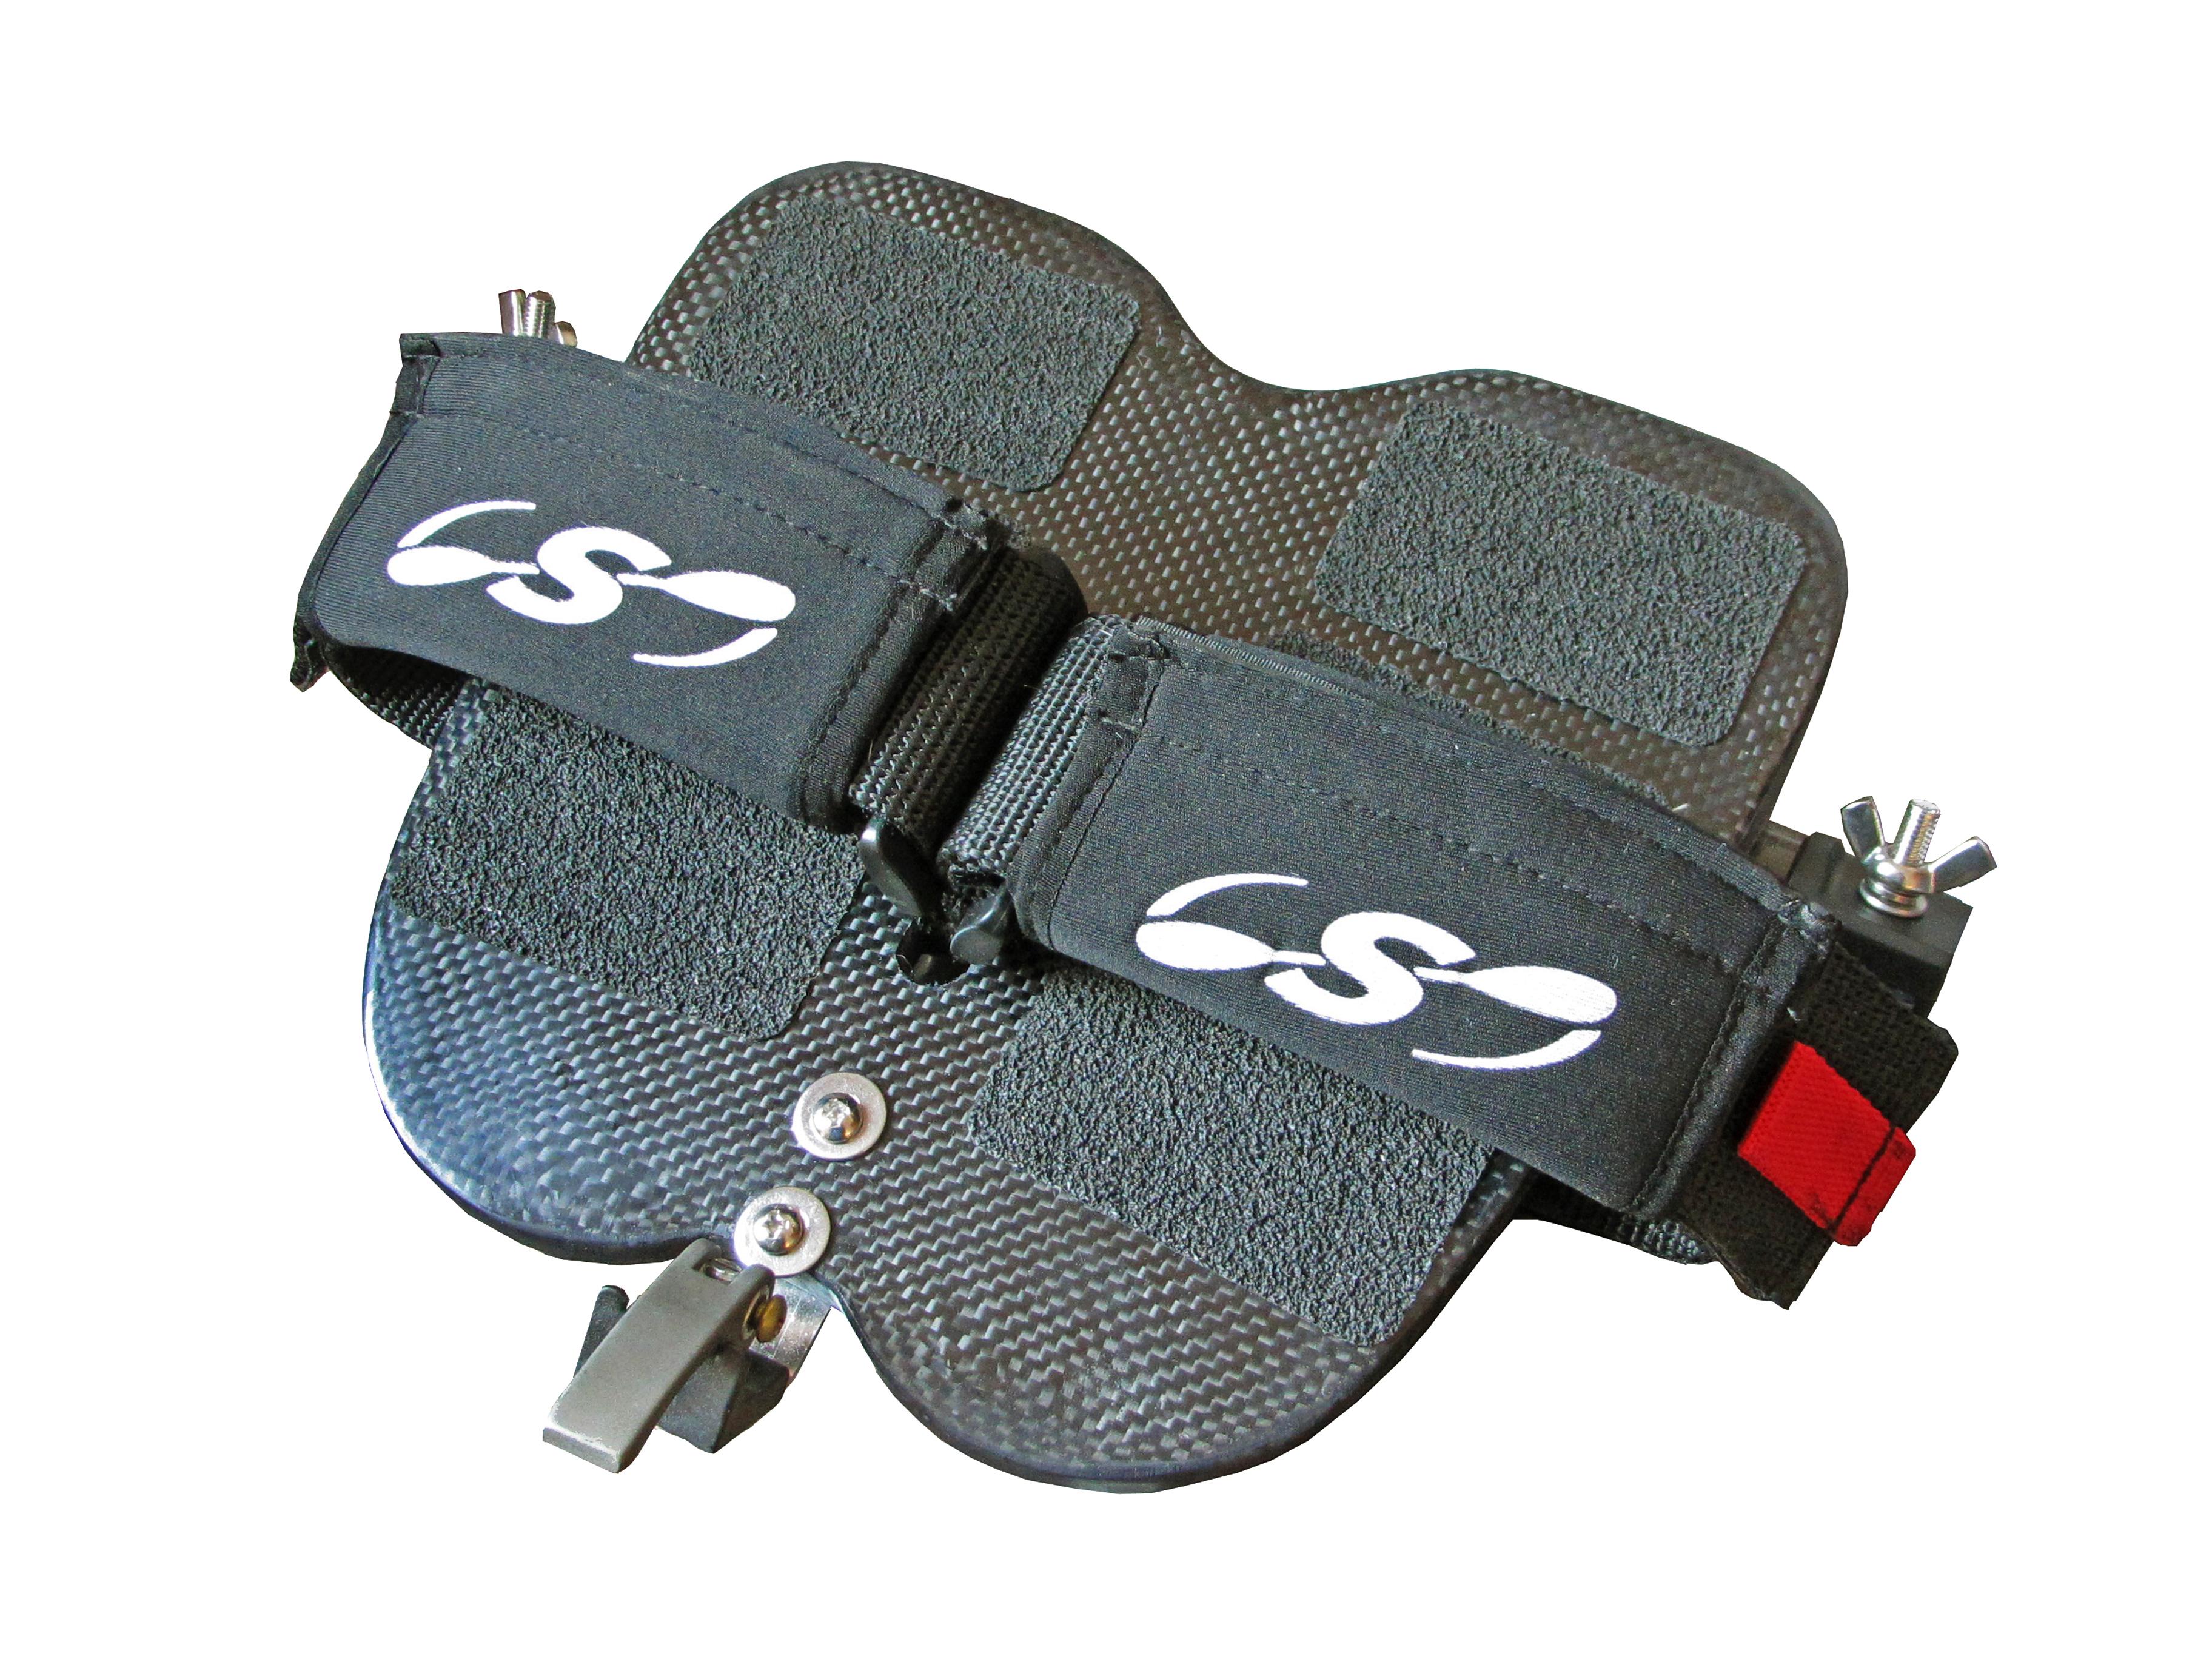 Footboard S2E Nonsteering - Complete